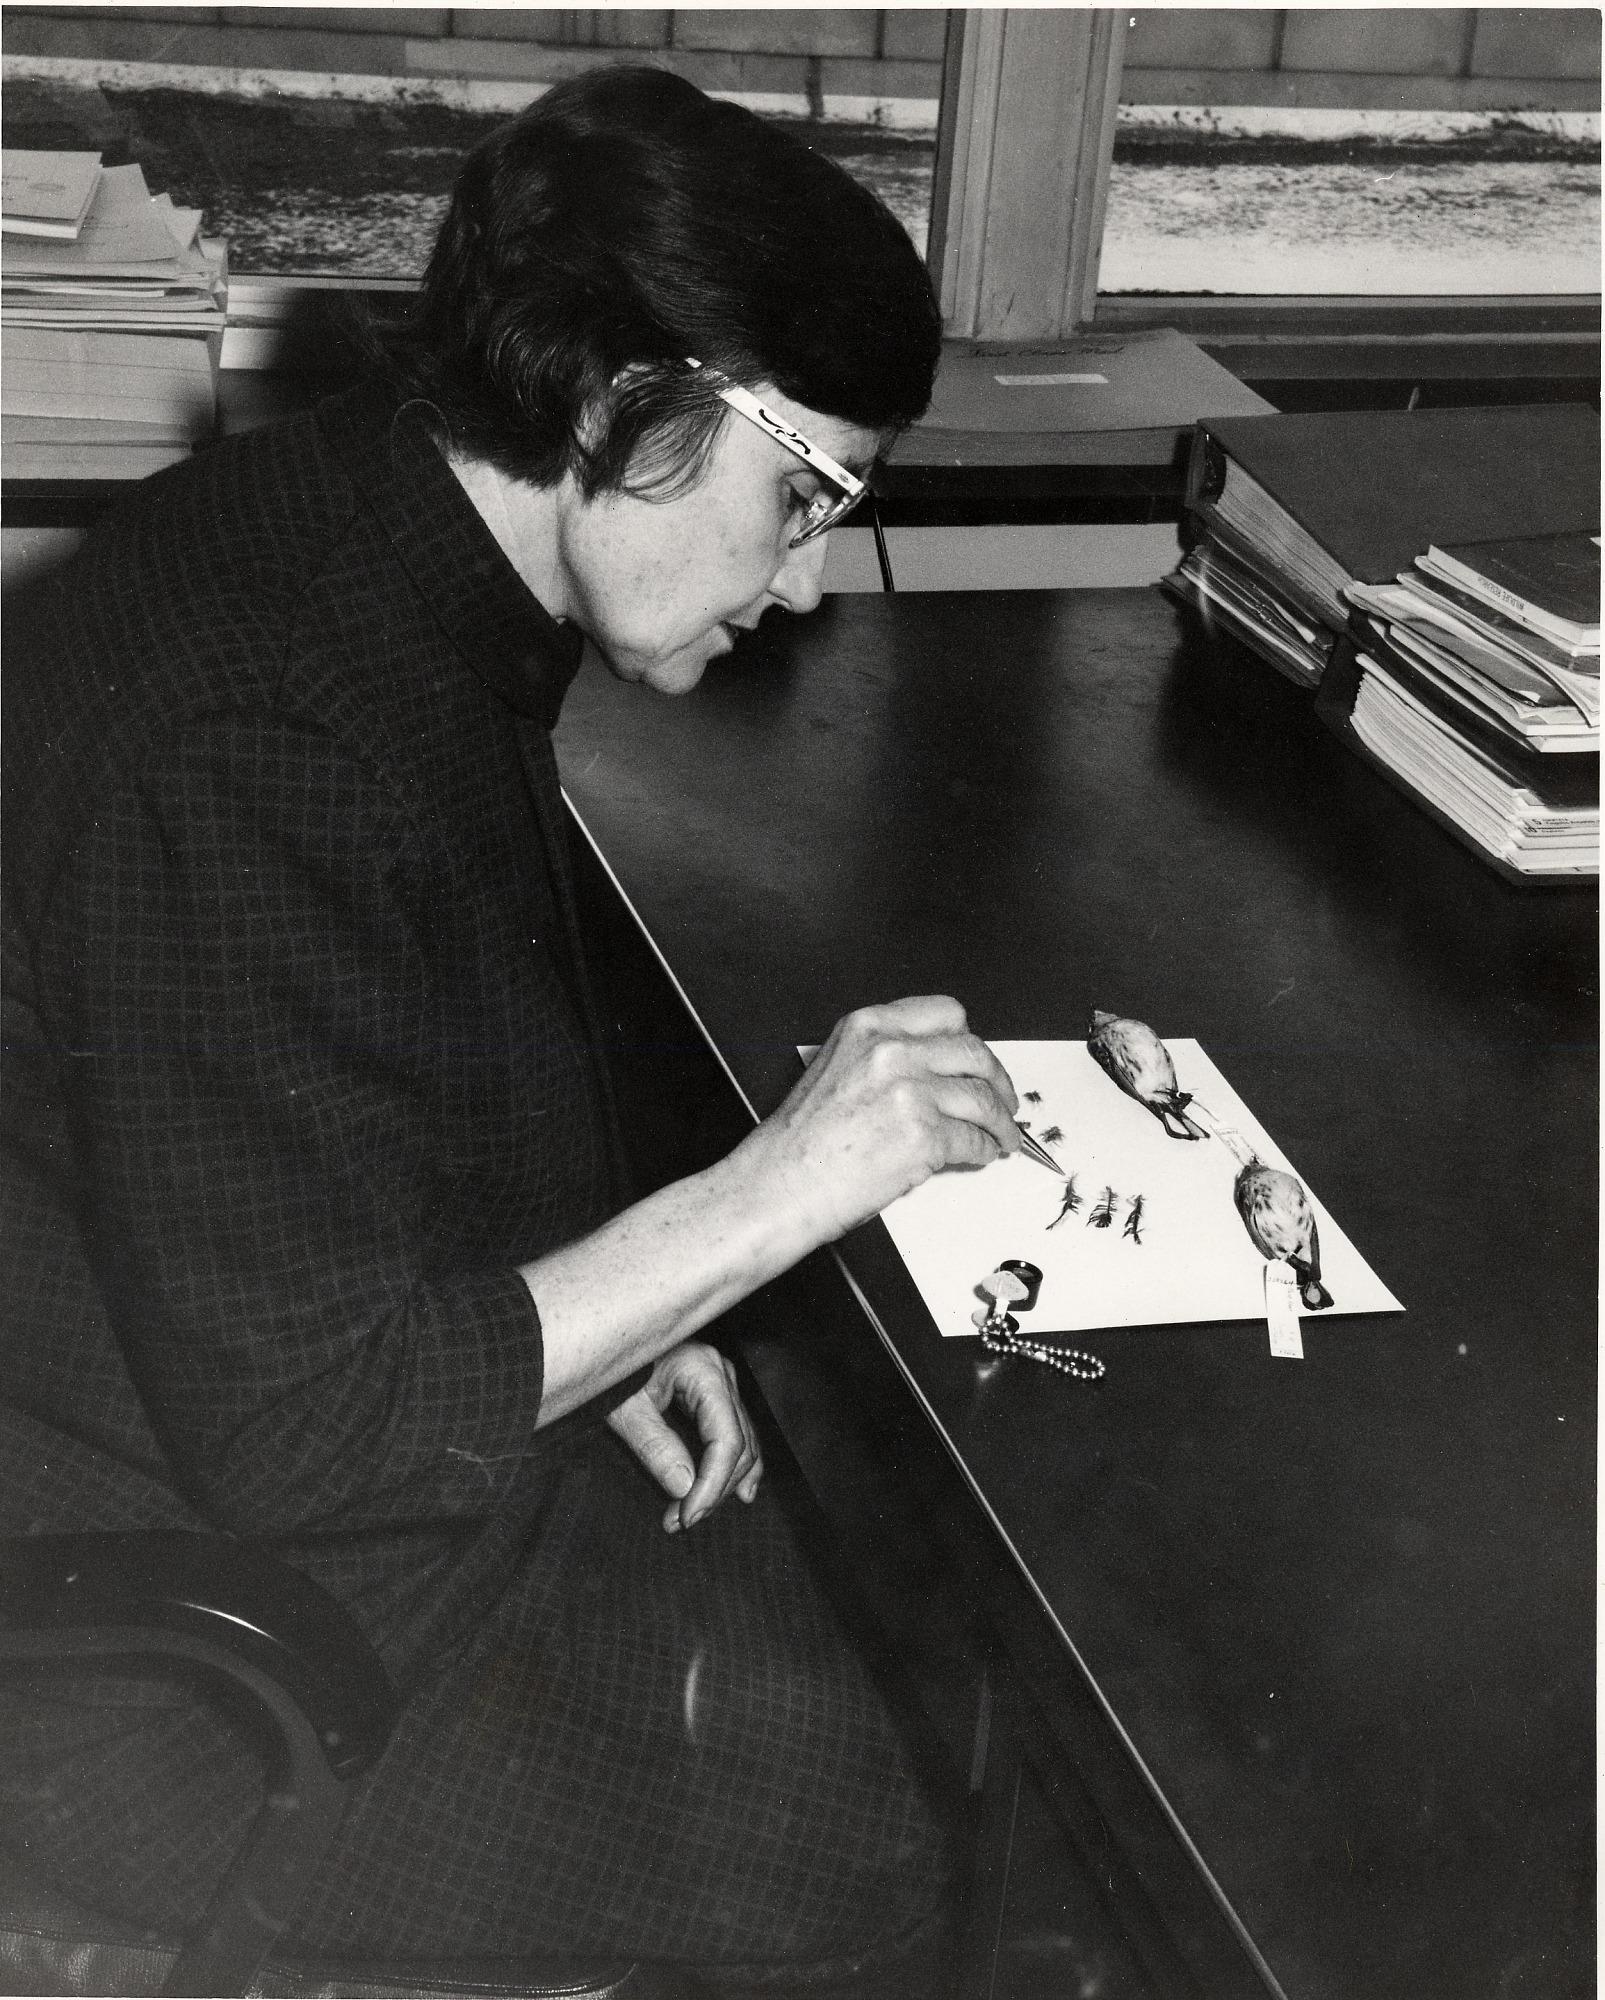 Roxie Collie S. Laybourne (1912-2003), identifying bird feathers, c. 1944